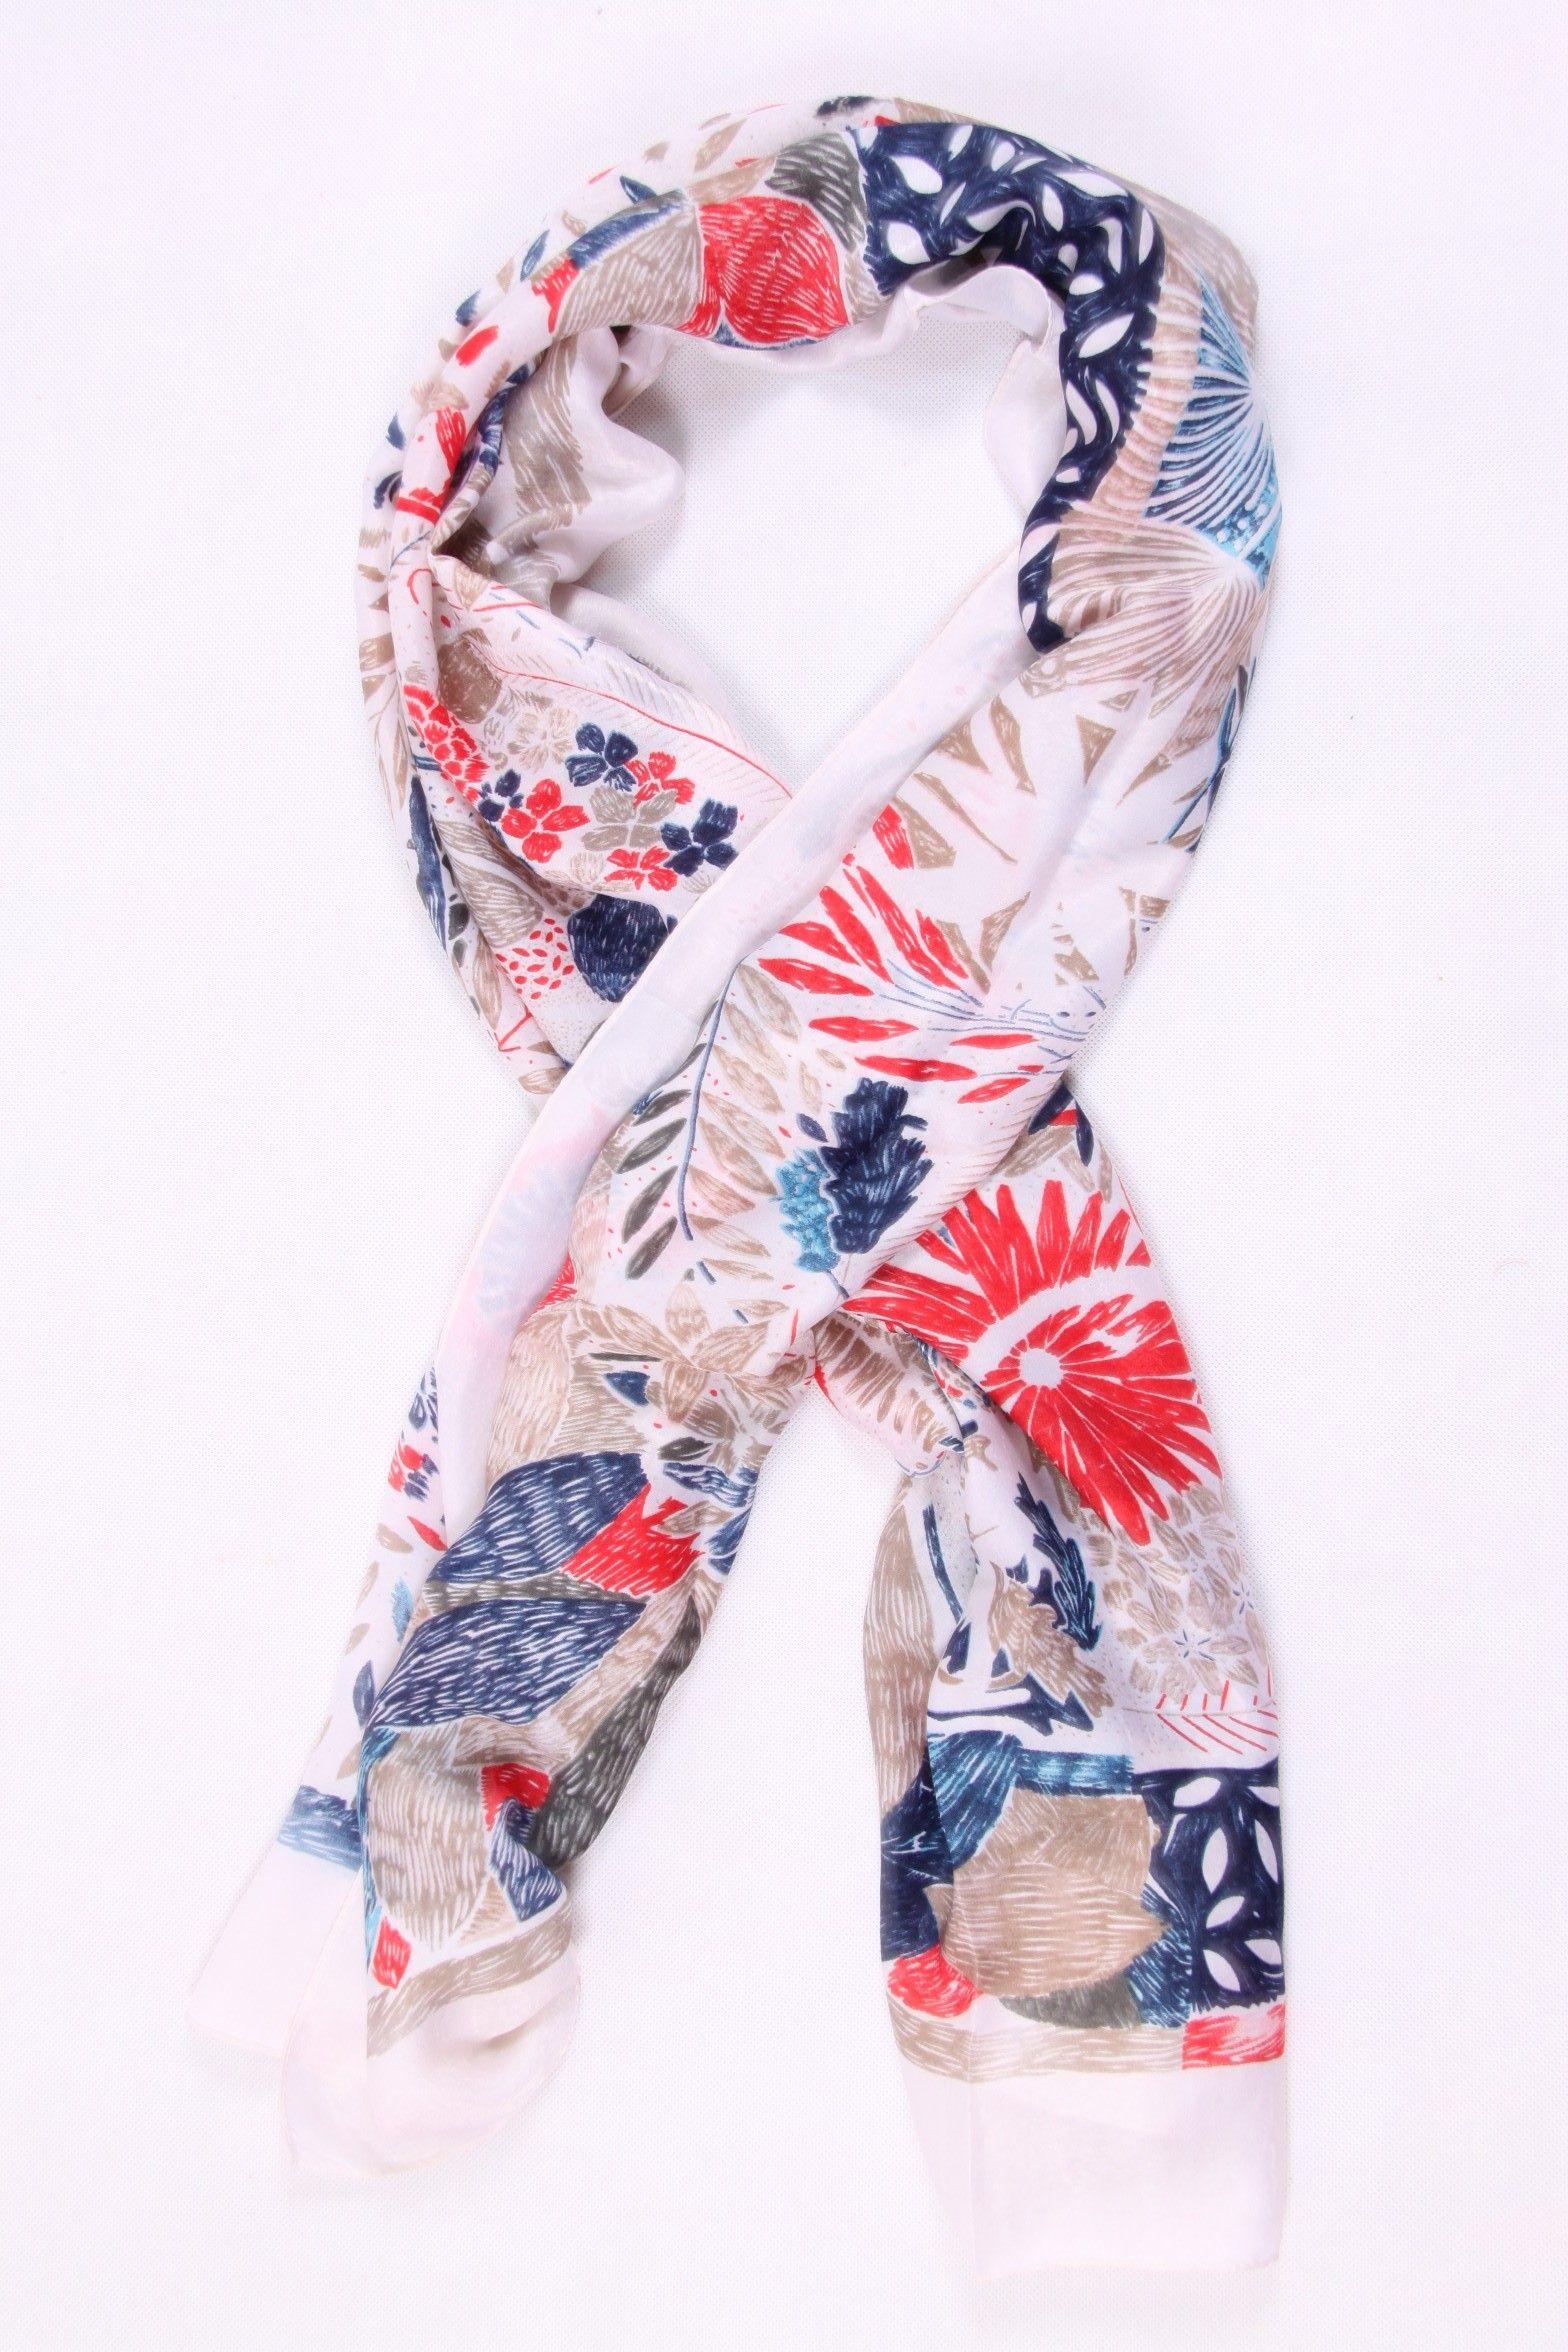 c11fd71b5ccd Foulard rouge 100 % soie   Foulard Femme   Pinterest